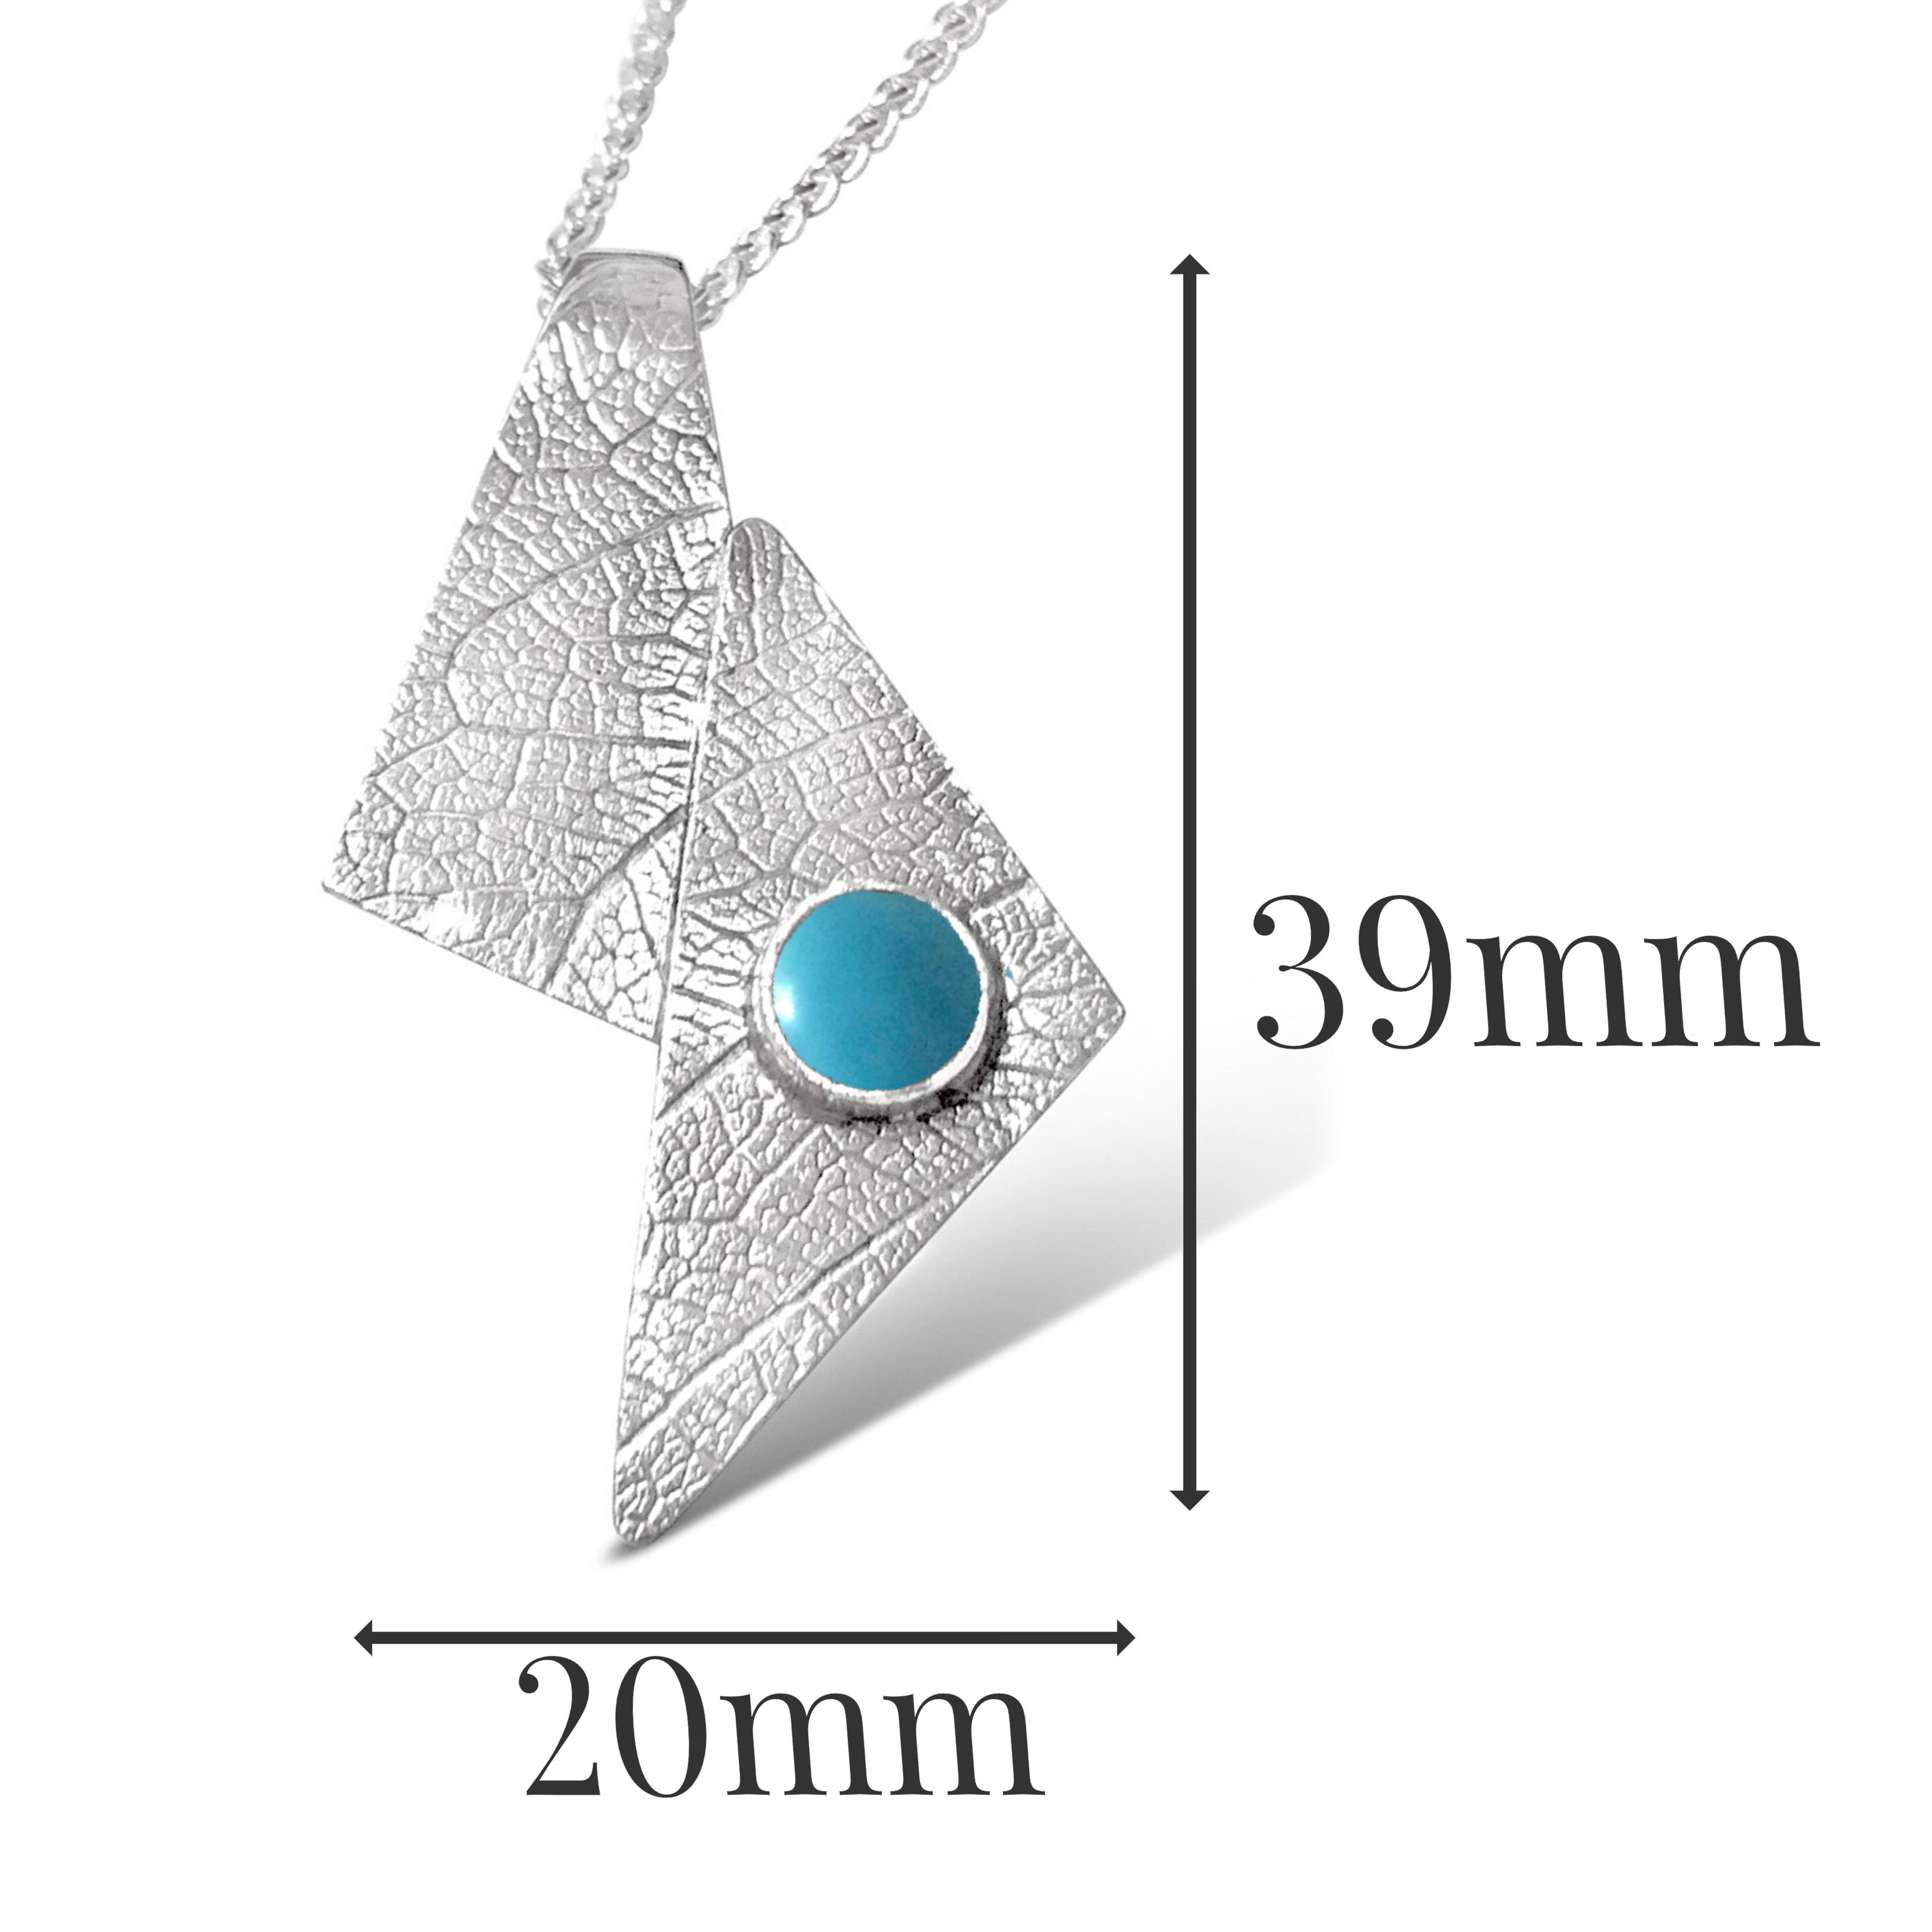 LP541 - Silver Turquoise Pendant Sizes